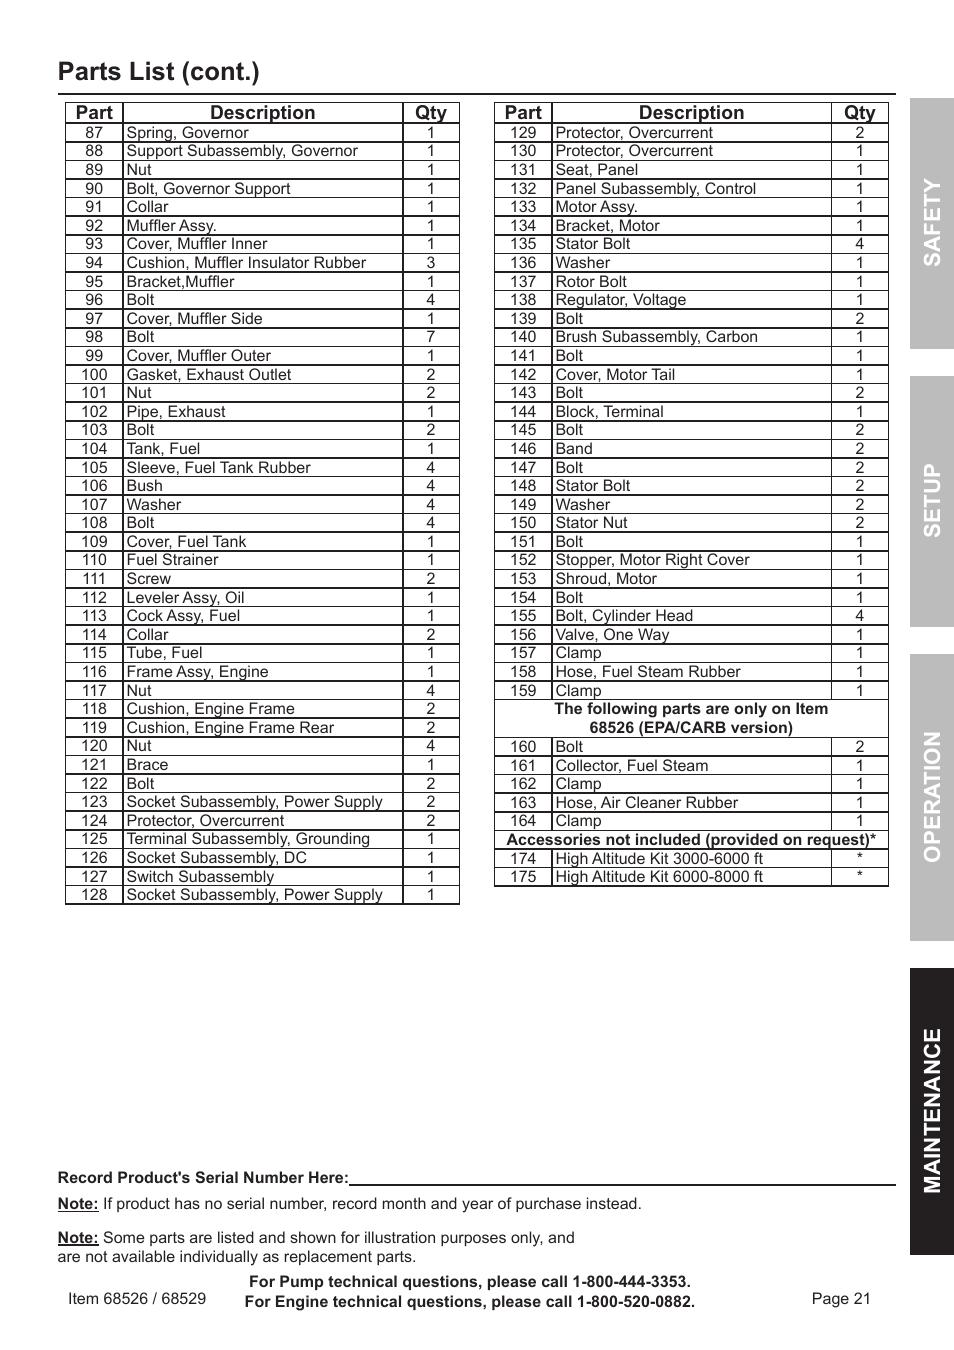 Parts list (cont.), Safety o pera tion m aintenance setup